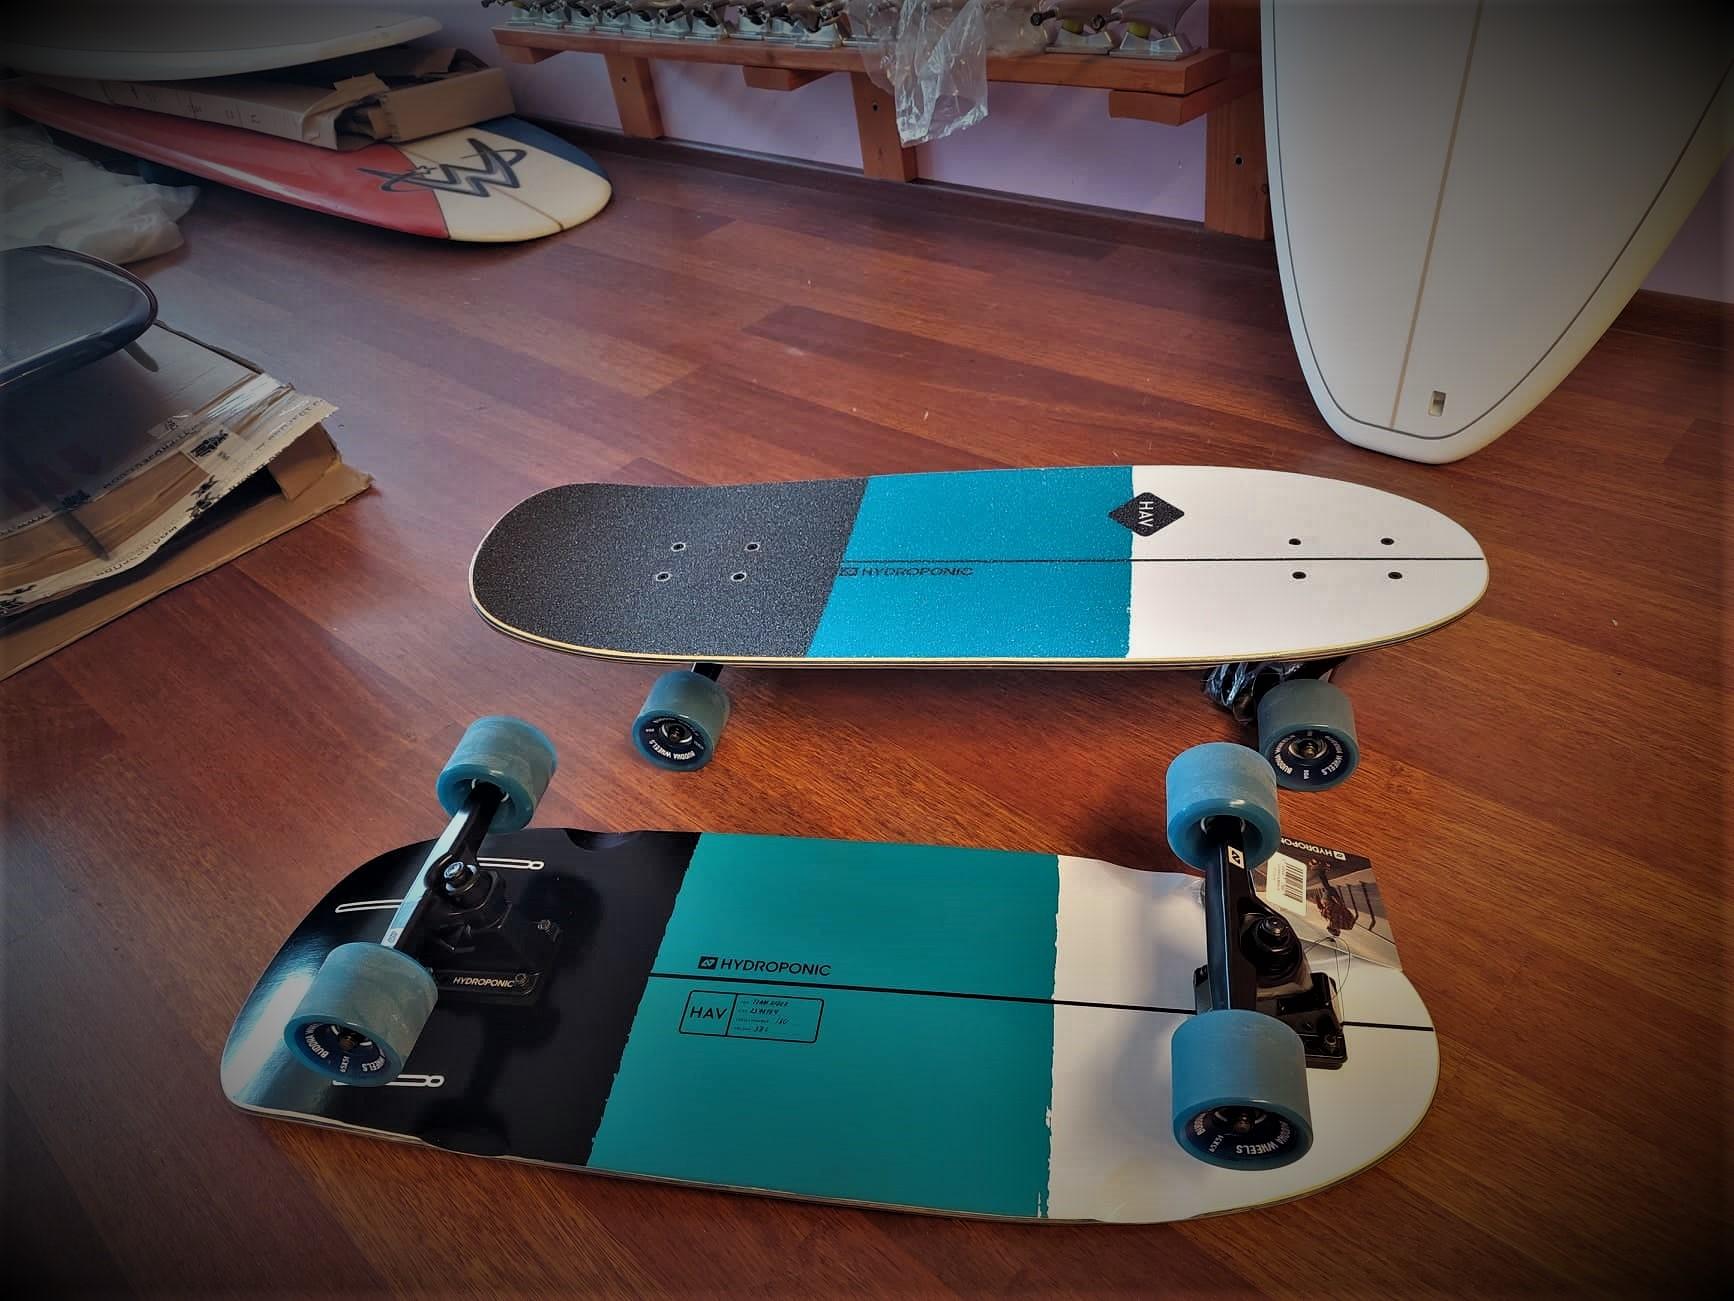 Hydroponic HAV surfskate